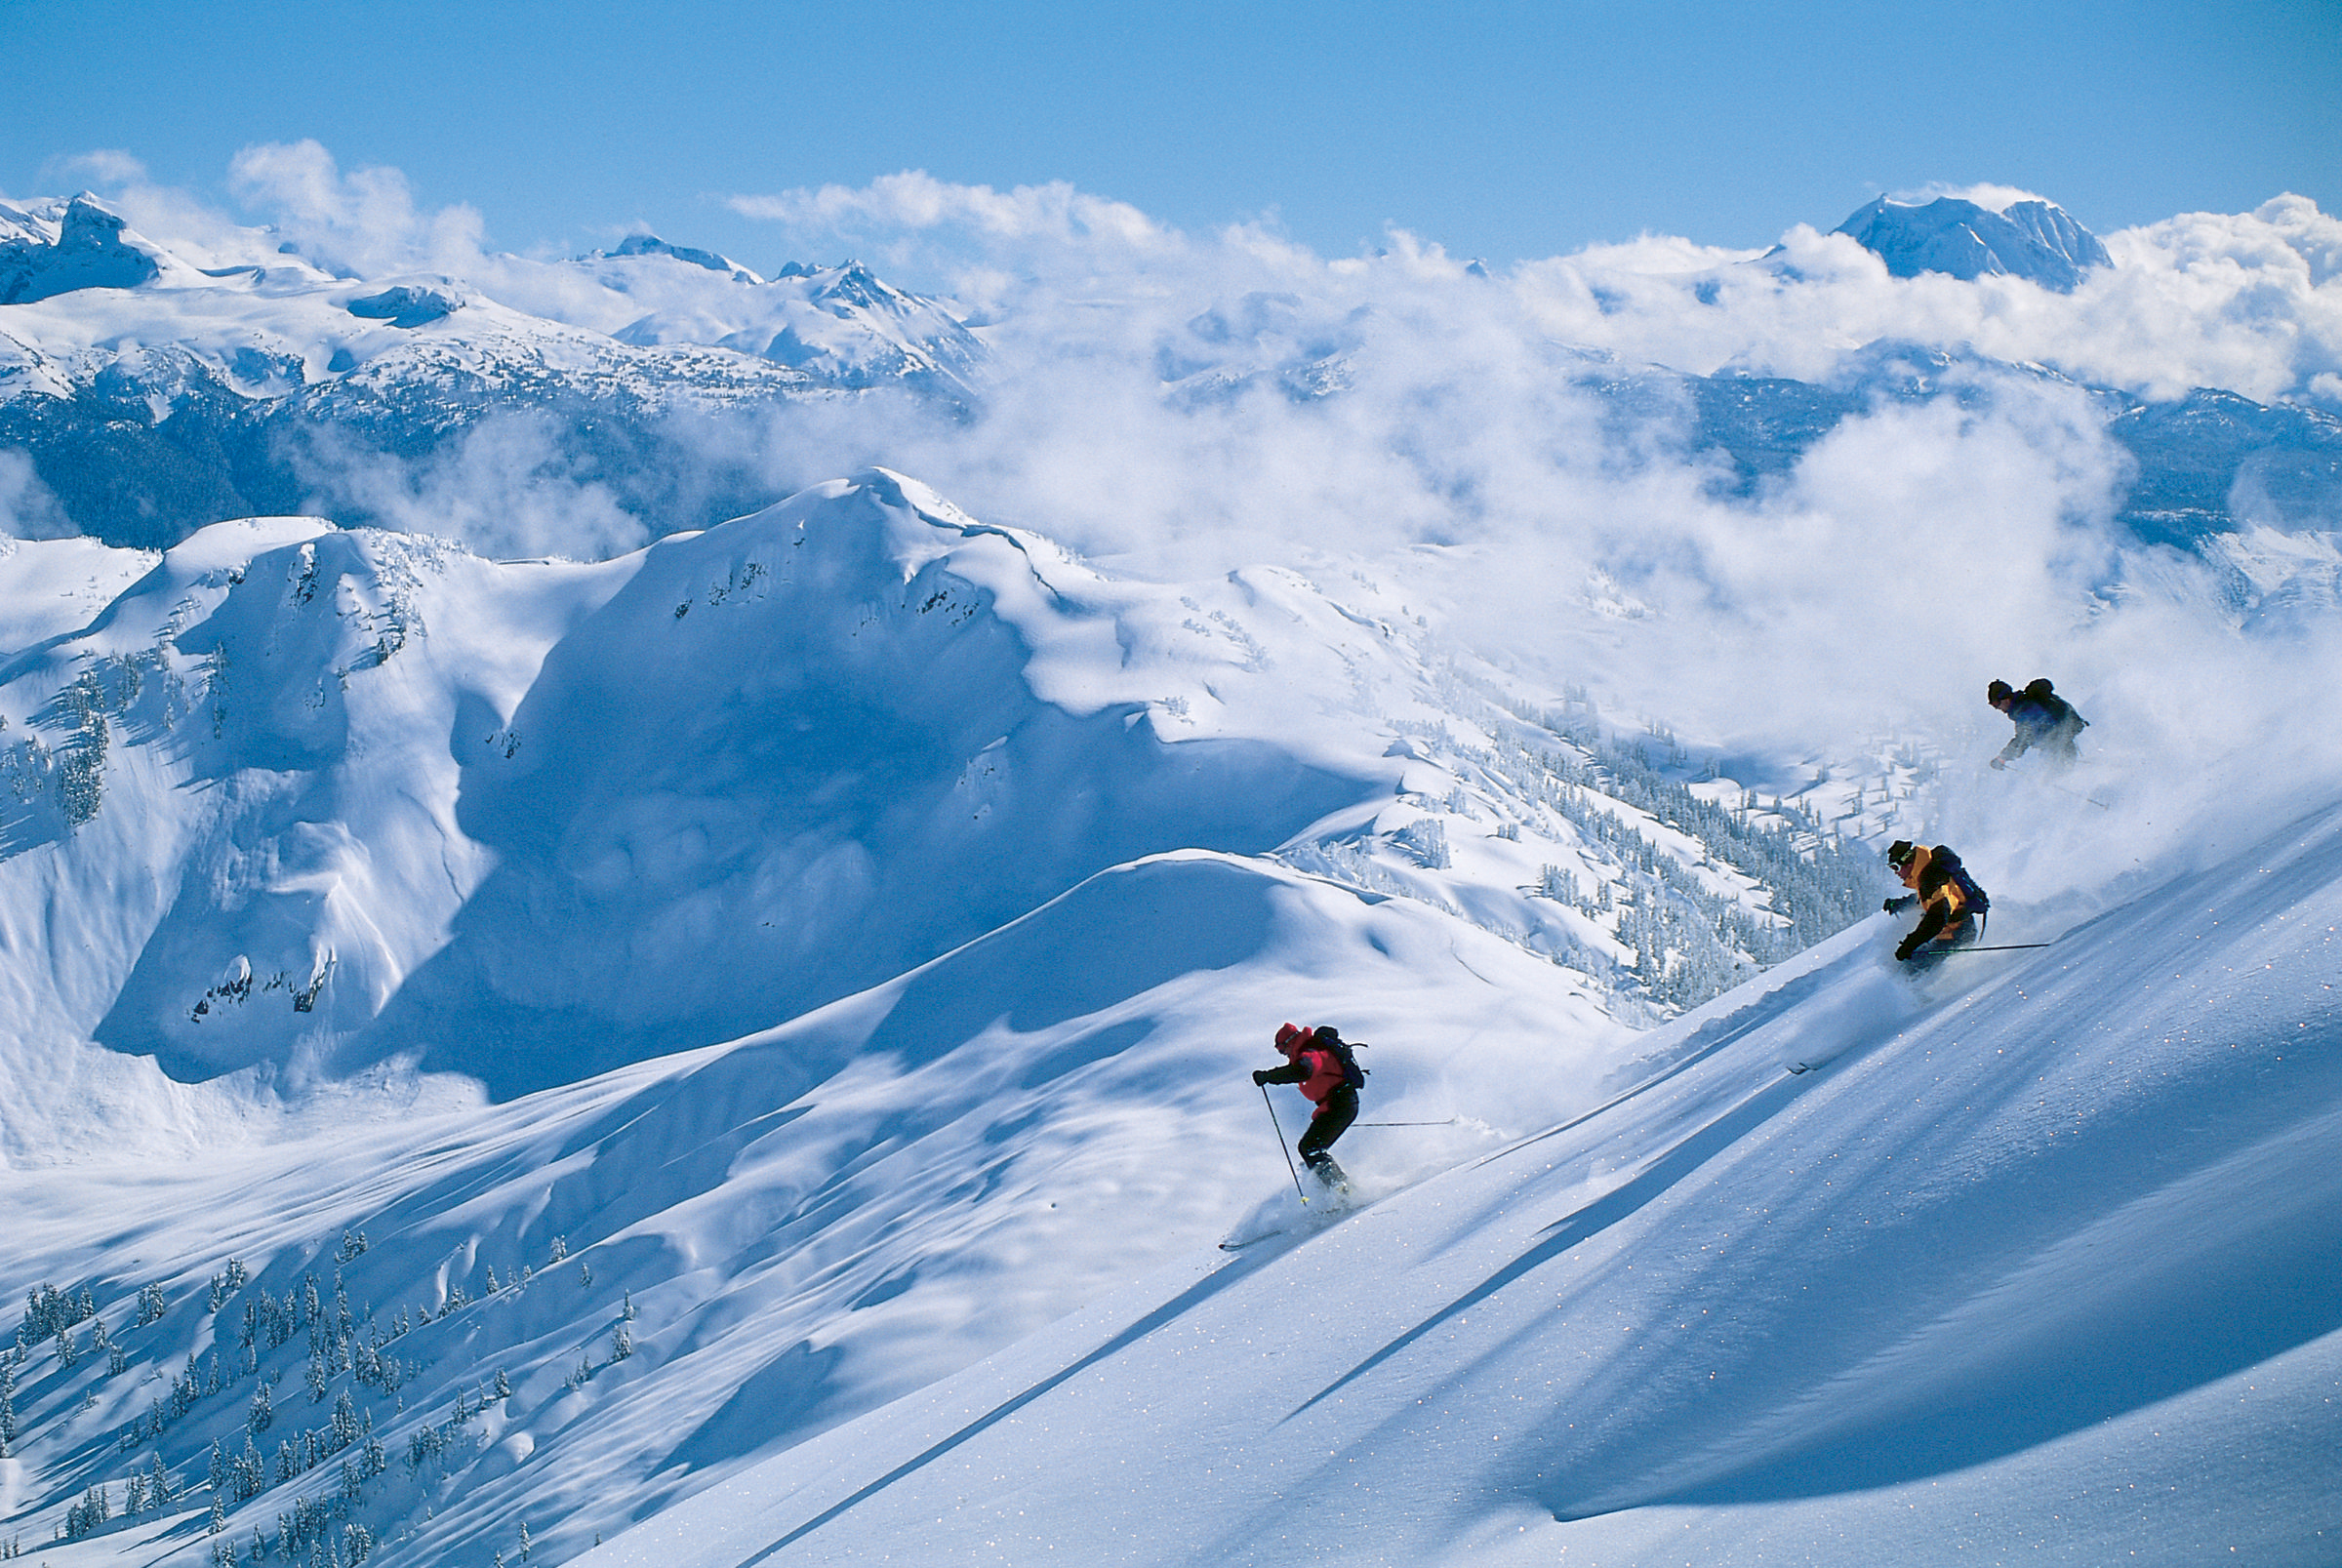 ski-resort-striking-whistler-ski-resort-real-estate-whistler-ski-resort-at-vancouver-whistler-ski-resort-address-whistler-ski-resort-airp.jpg